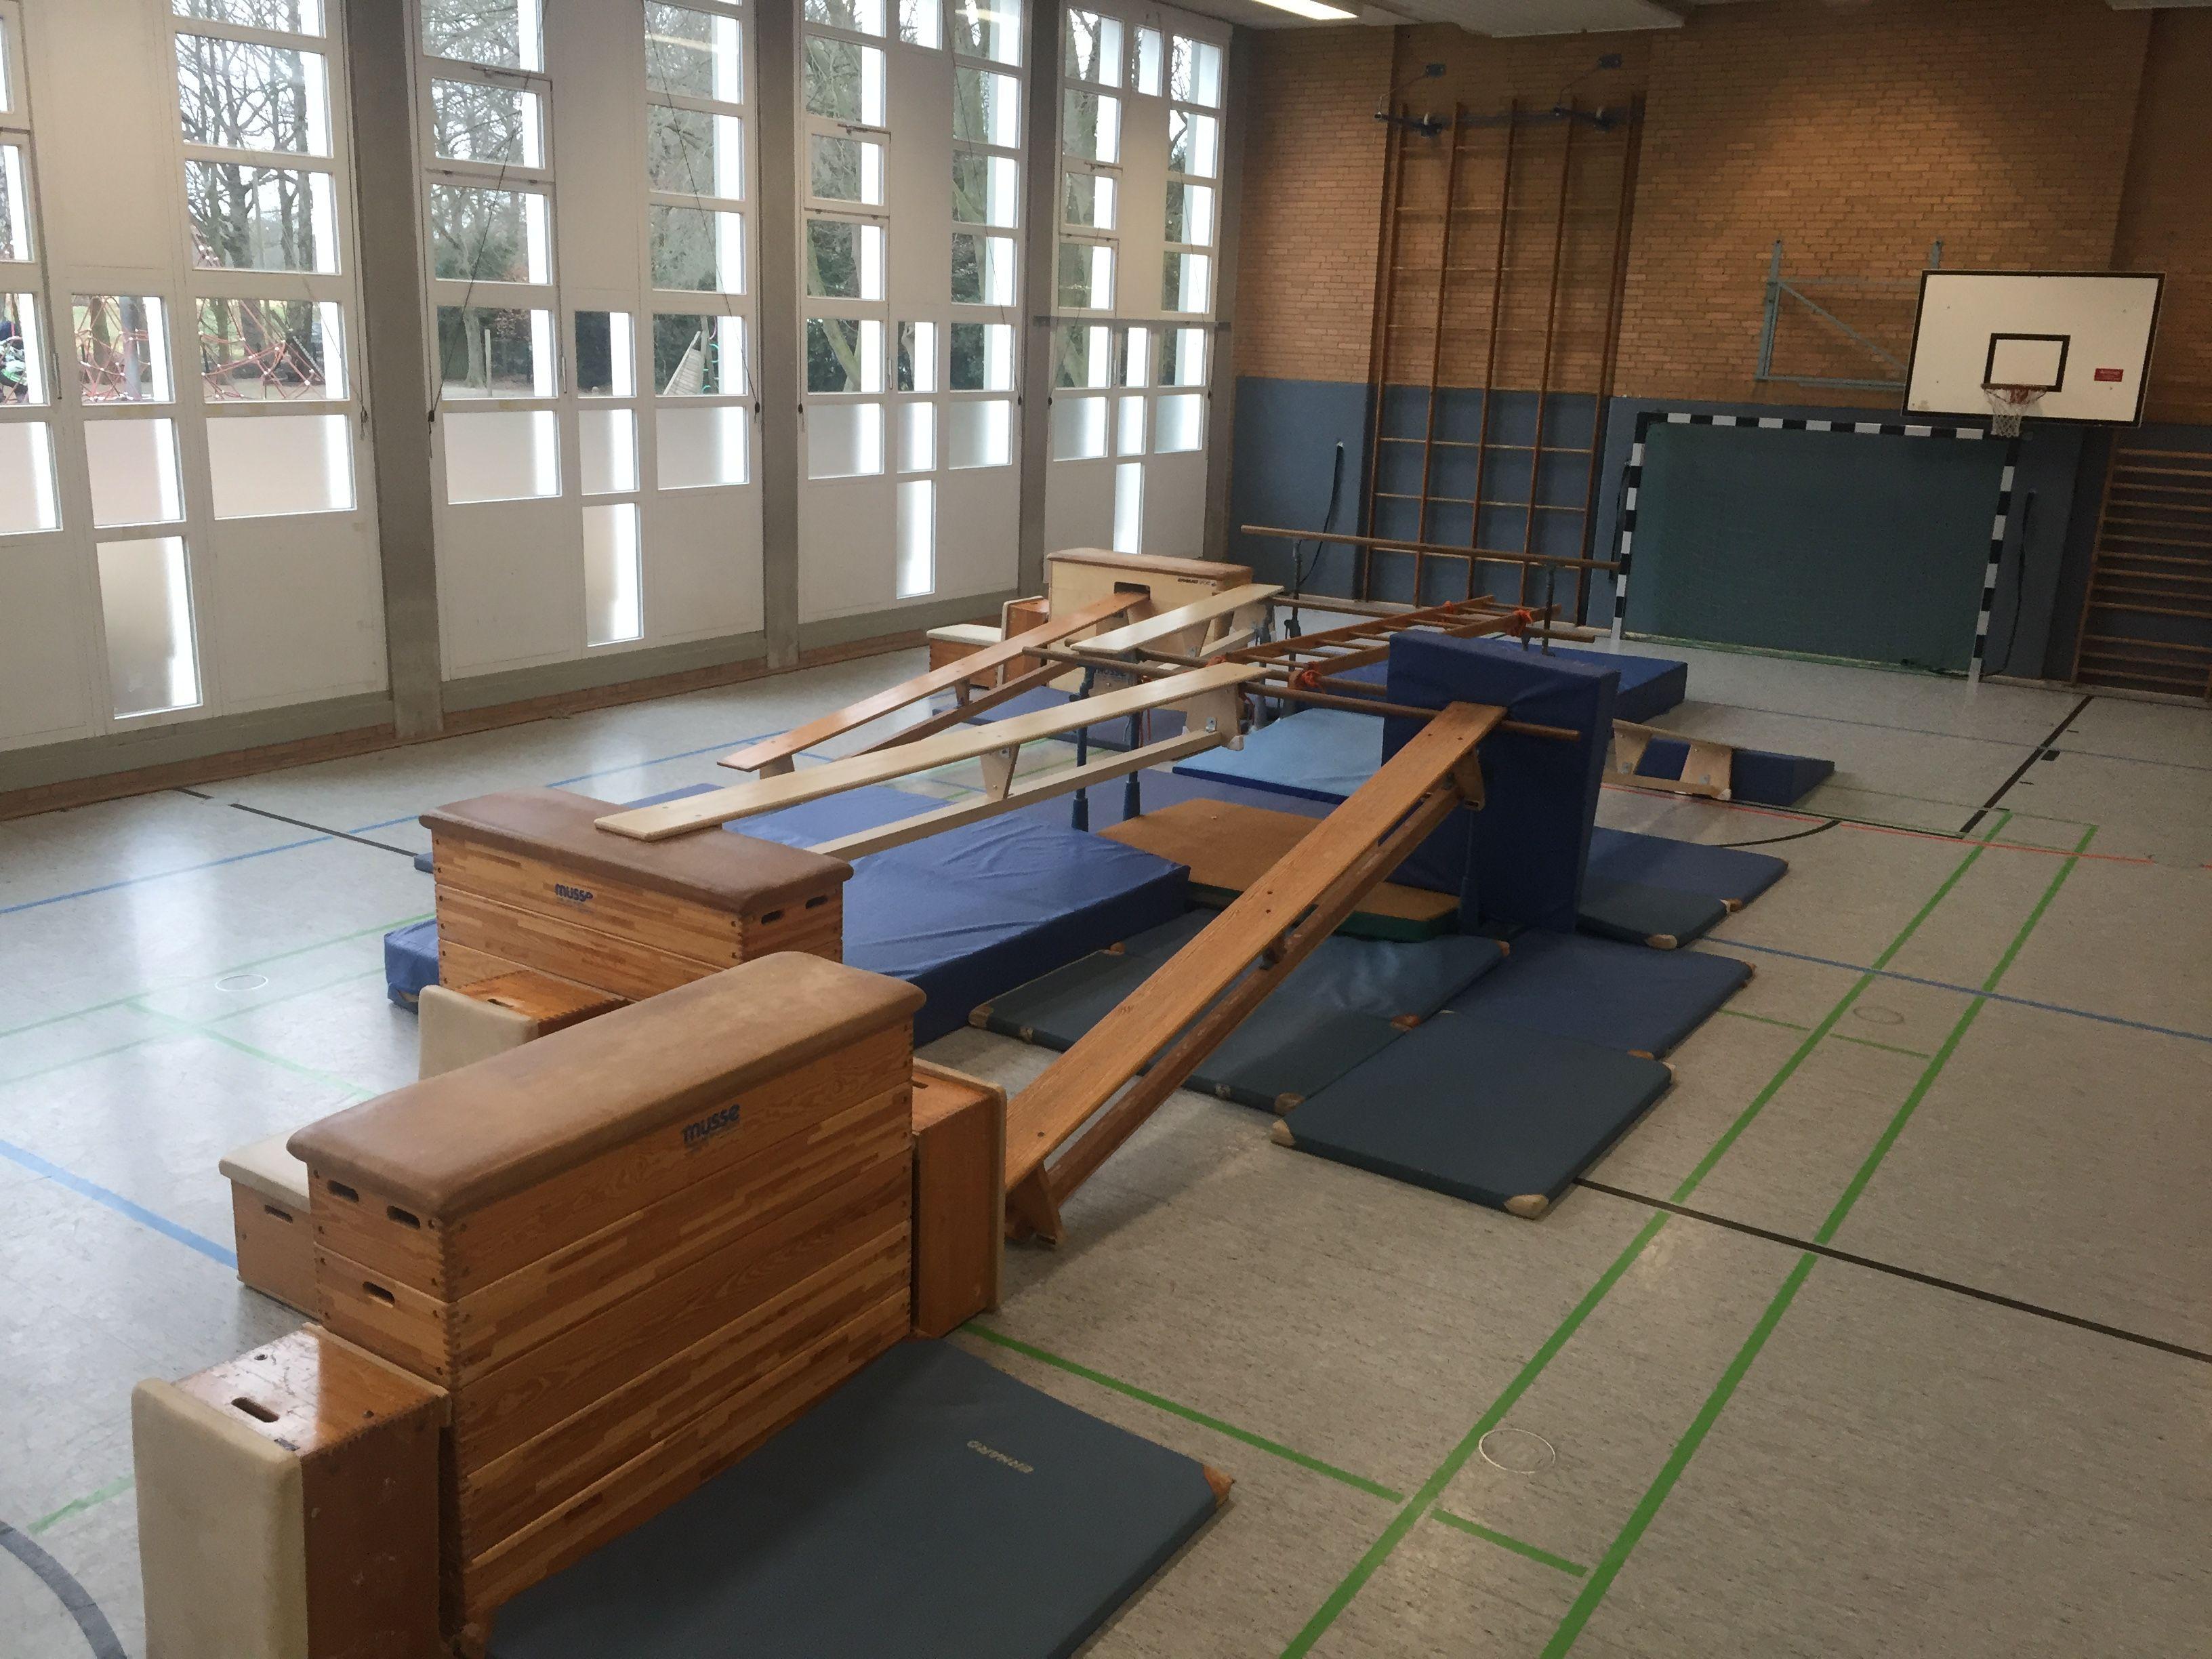 gym fitness studio - Kinderturnen Gerateaufbau Beispiele